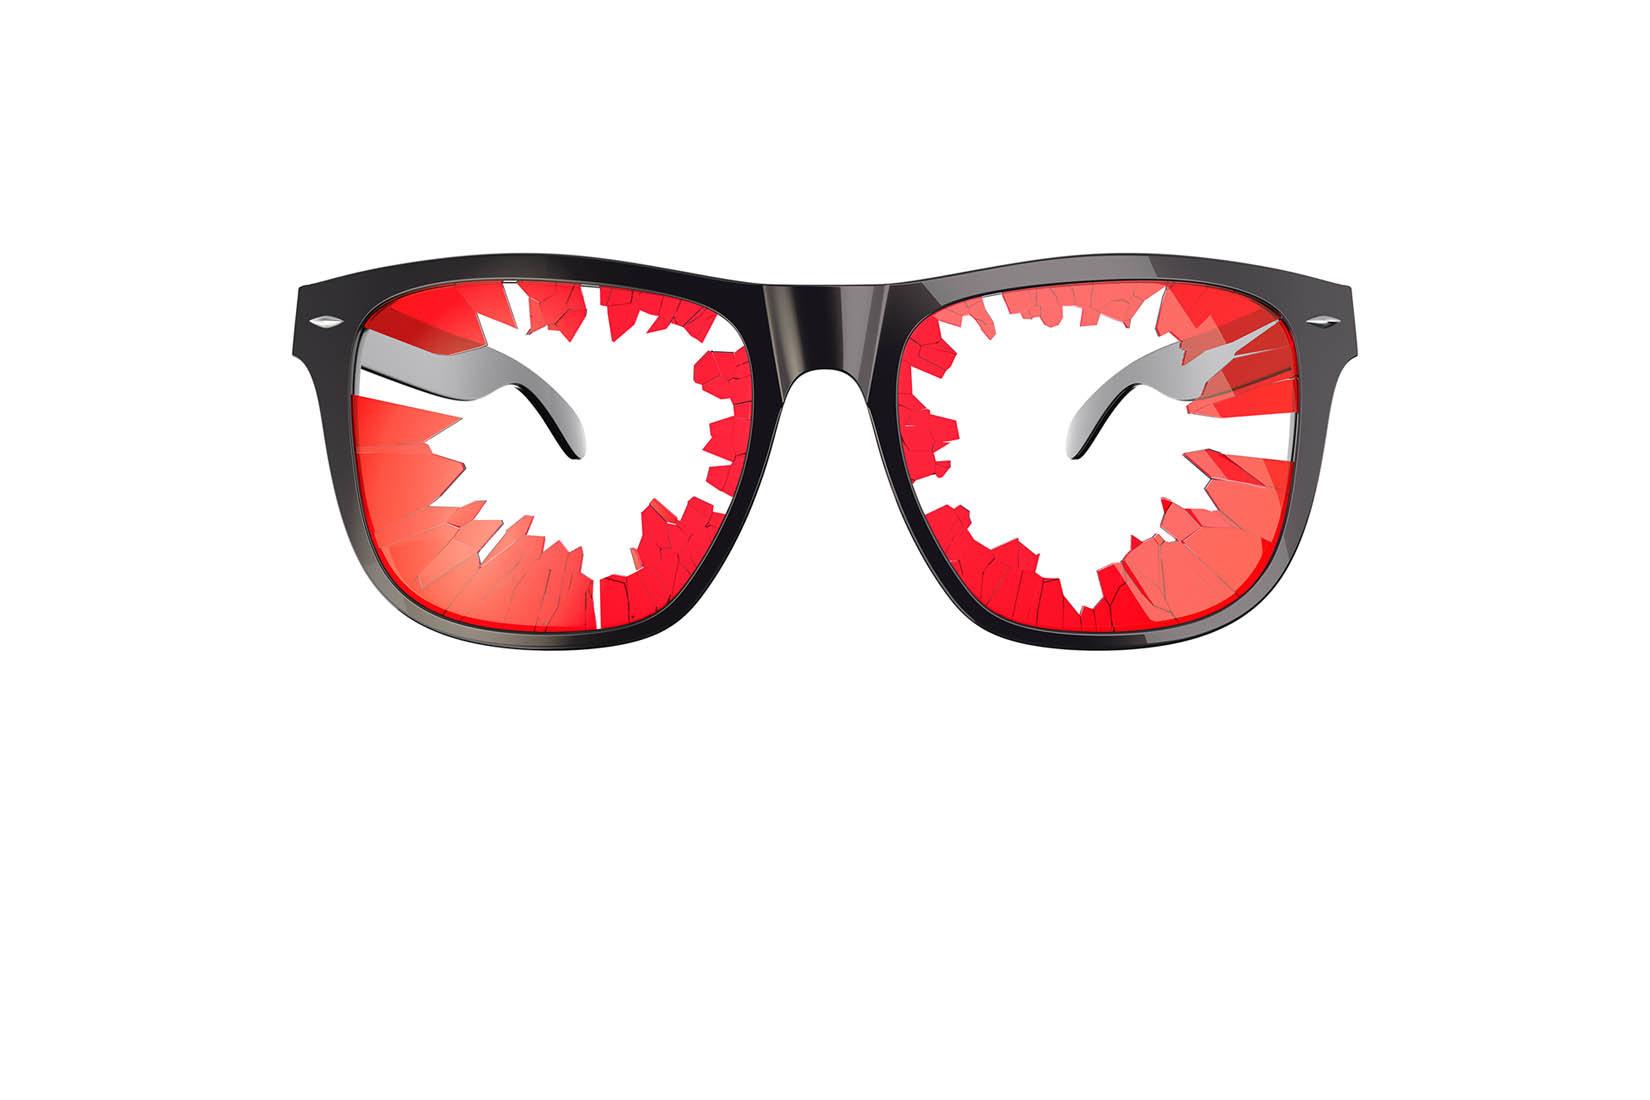 Repair Your Eyeglasses During Covid-19 Lockdown